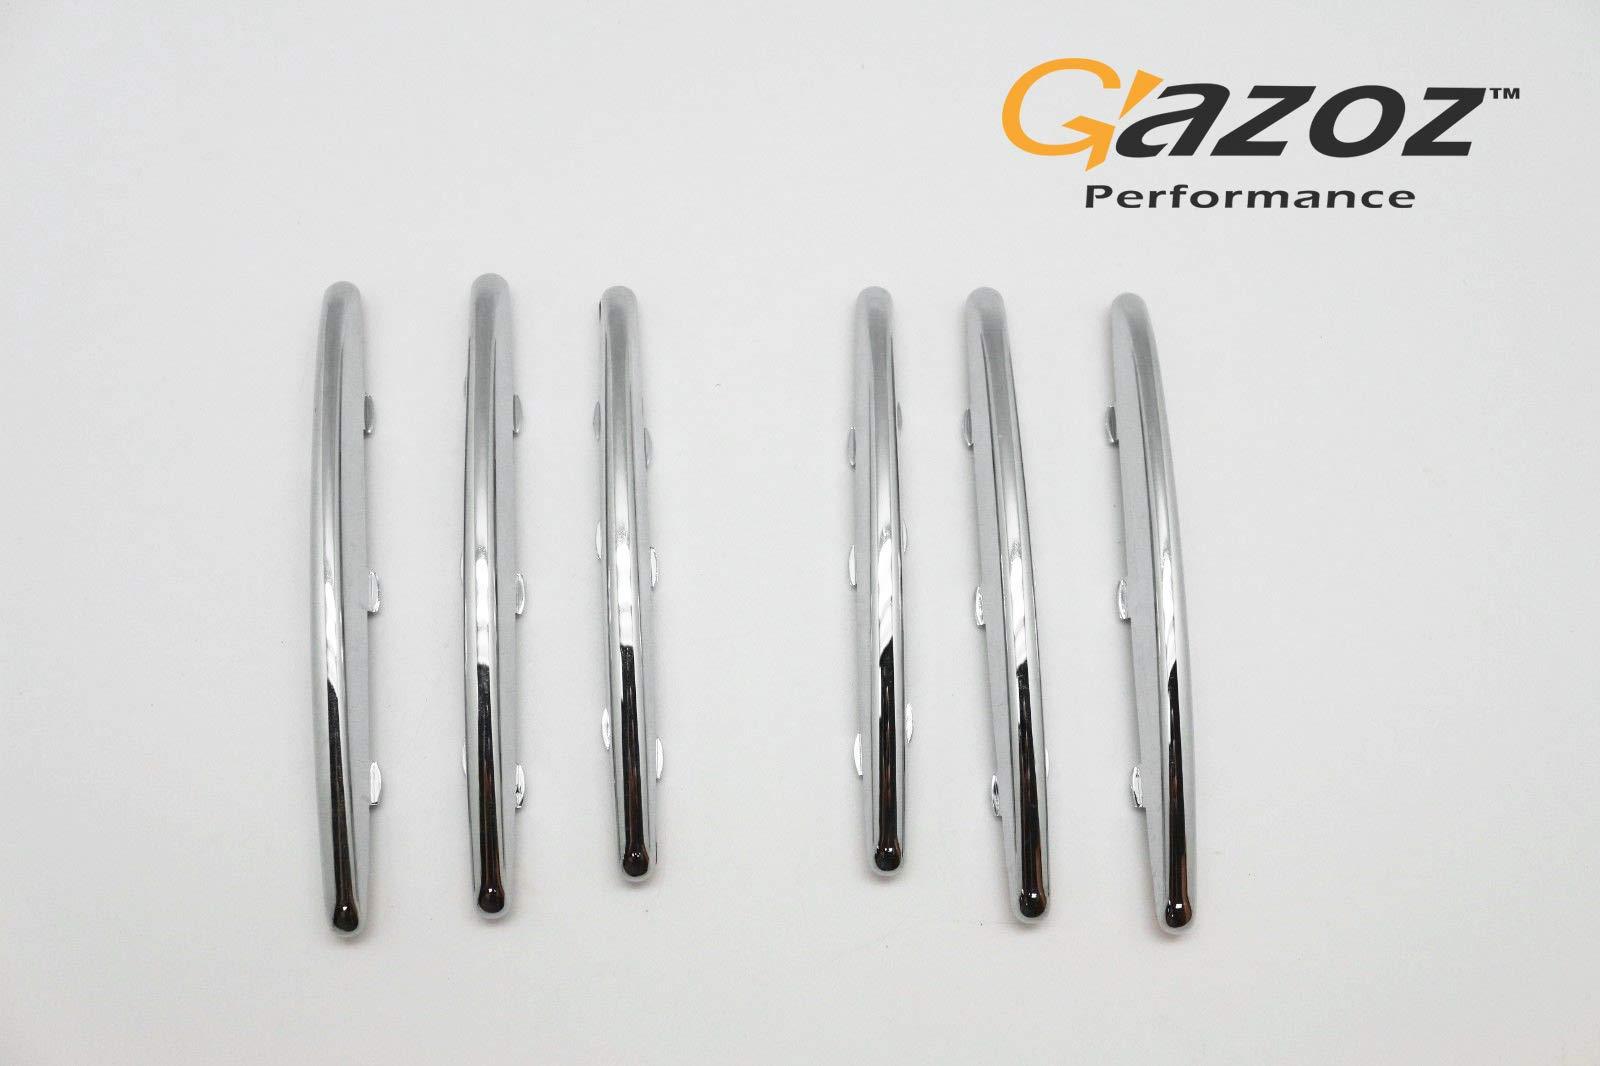 6 Chrome Hood Molding Grill Grille Vent Cover For 2004-2011 Mercedes Benz R171 SLK